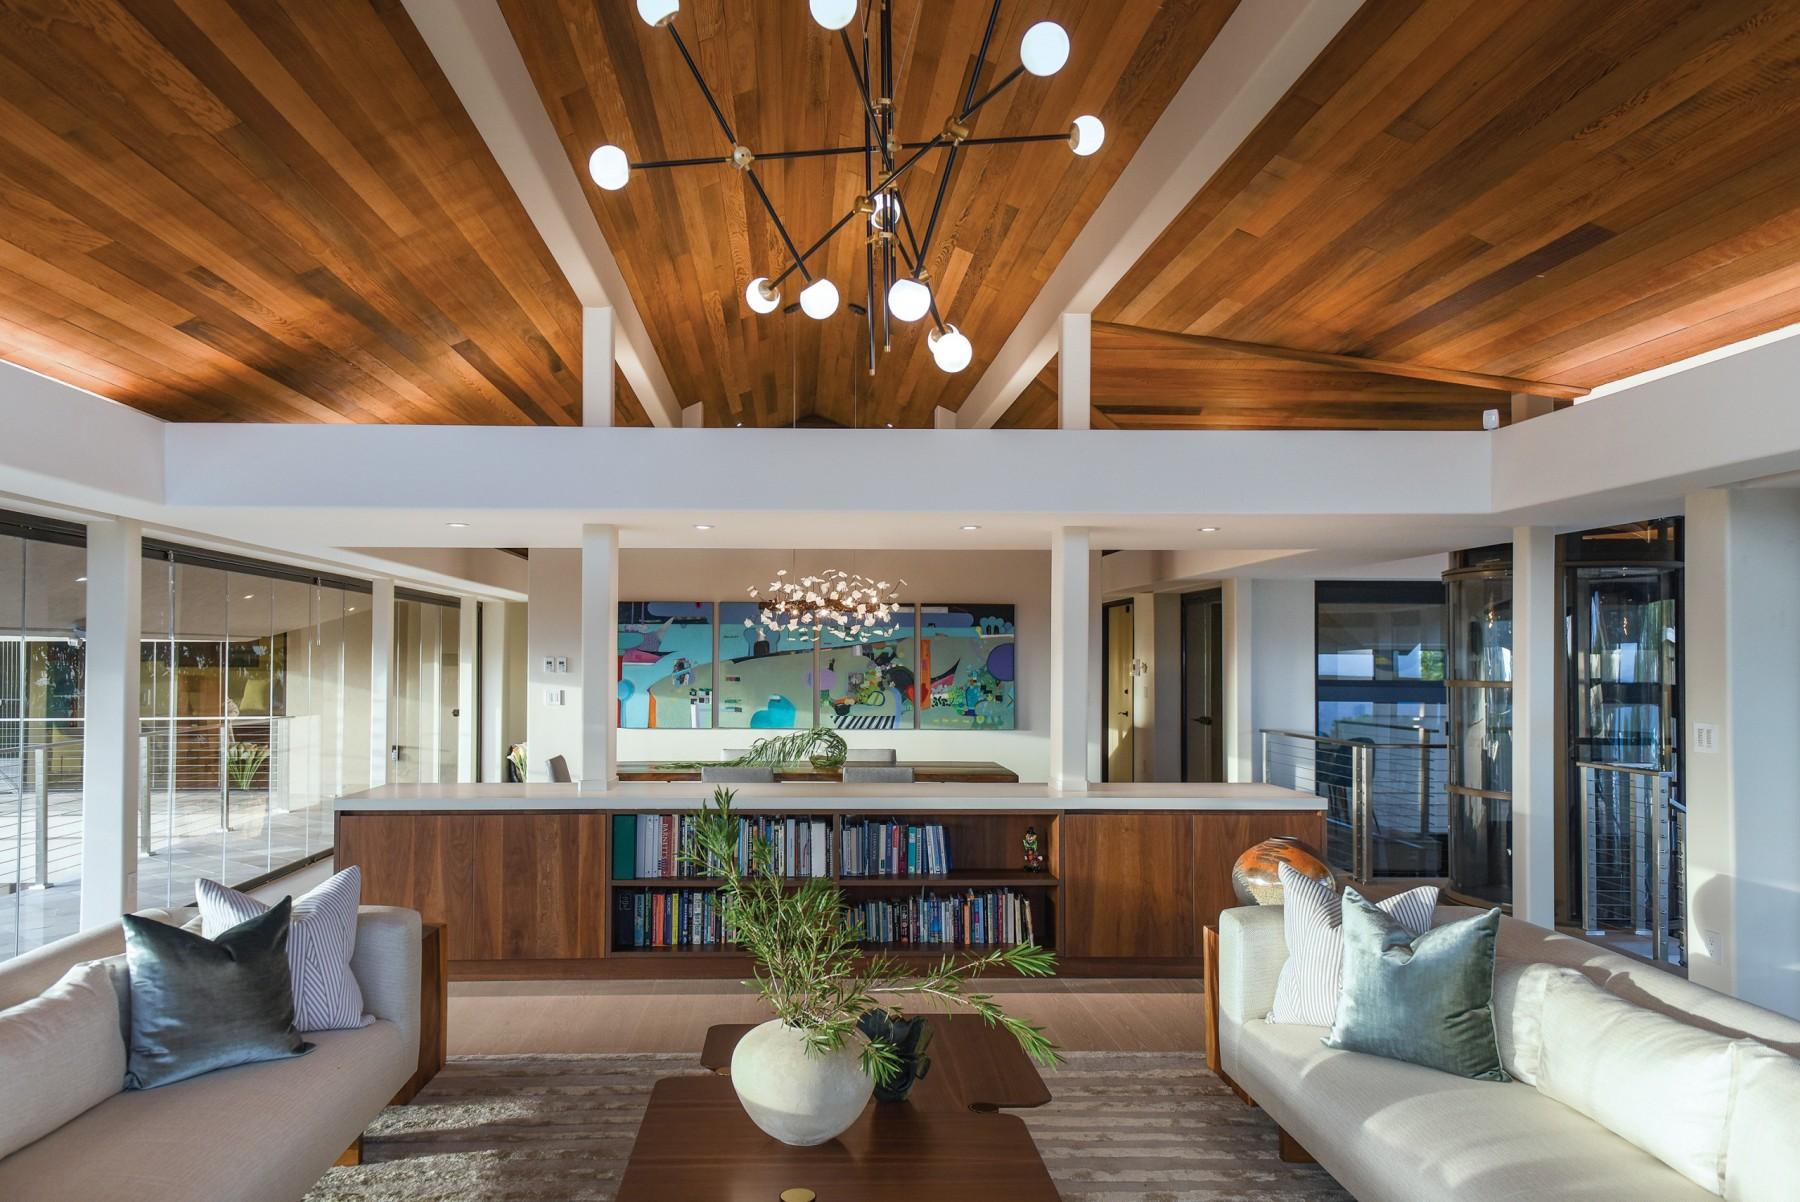 4 Mcyia Interior Architecture And Design Pc Andrew Matheson